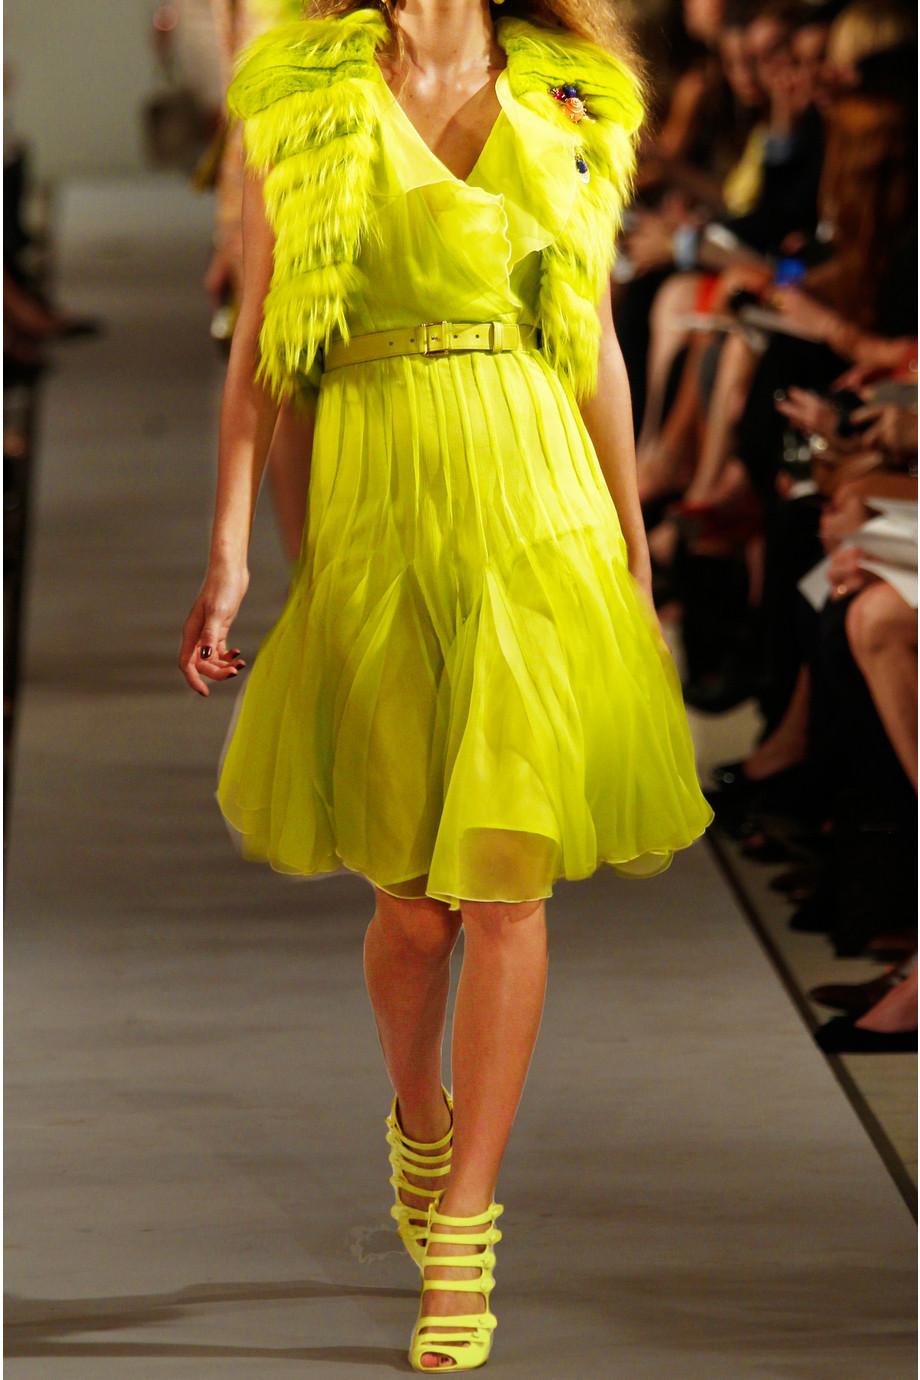 Bright-neon-yellow-bridesmaid-dress-inspiration-oscar-de-la-renta.full